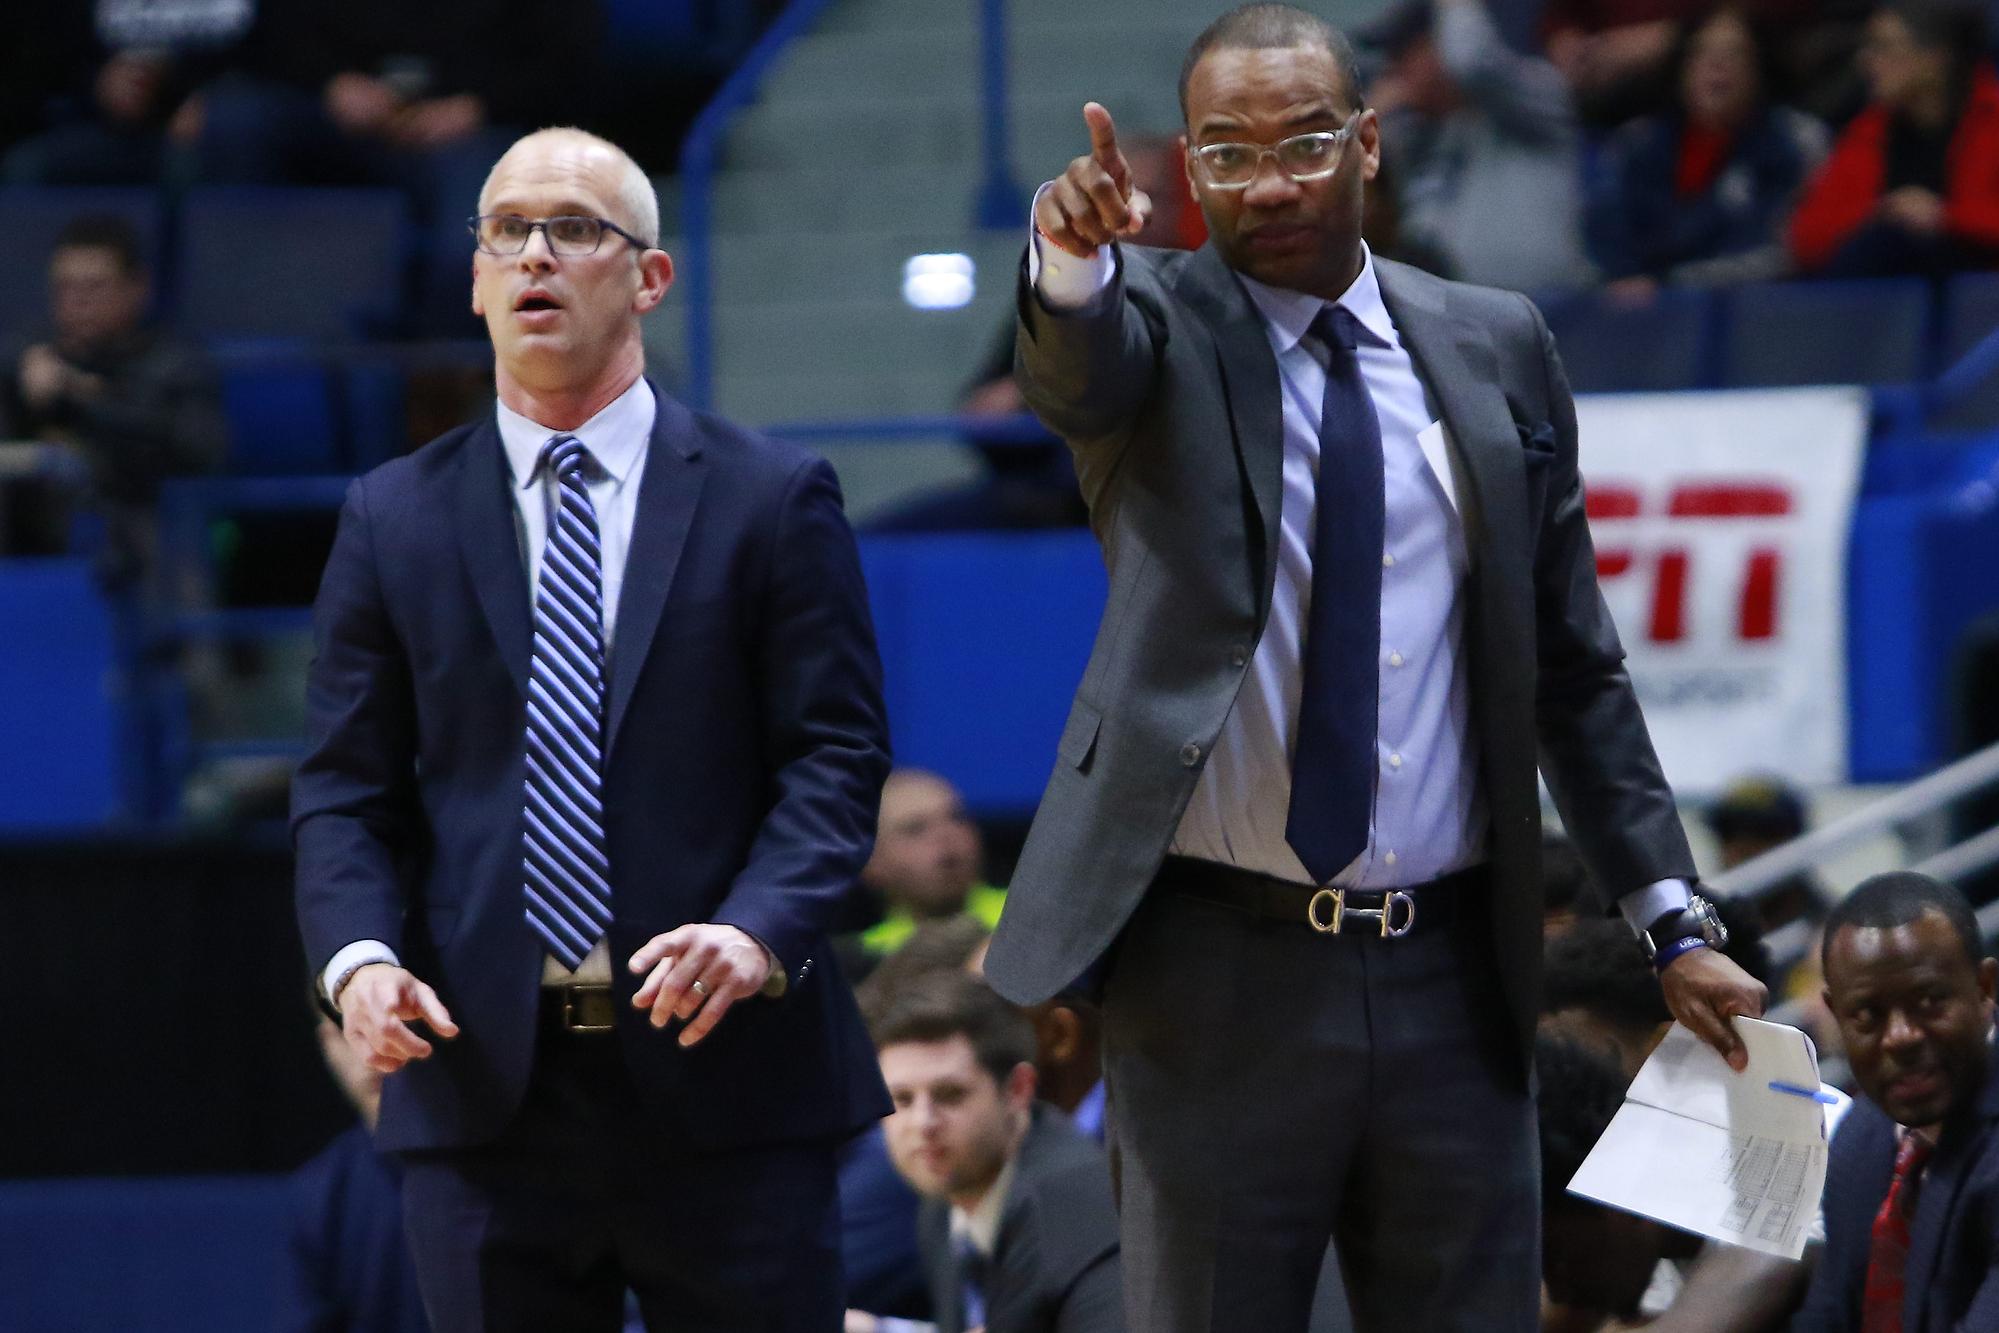 UConn Men's Basketball head coach Dan Hurley